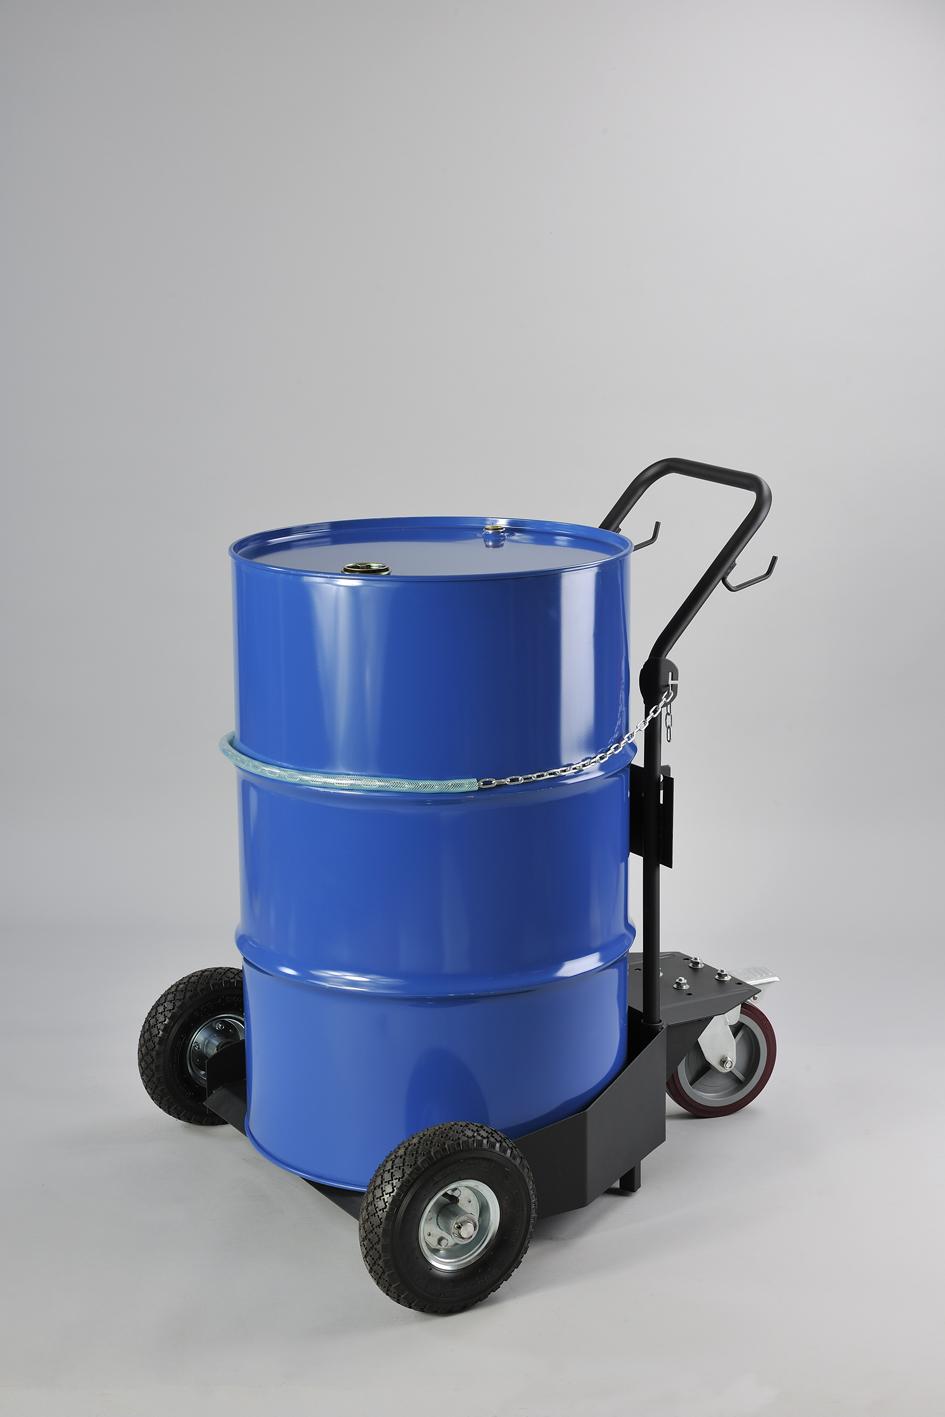 Plastic Gas Cans >> Model Nos. PT45 - PT45X Platform Drum Trucks / Barrel Trolleys - IGE - Industrial & Garage Equipment